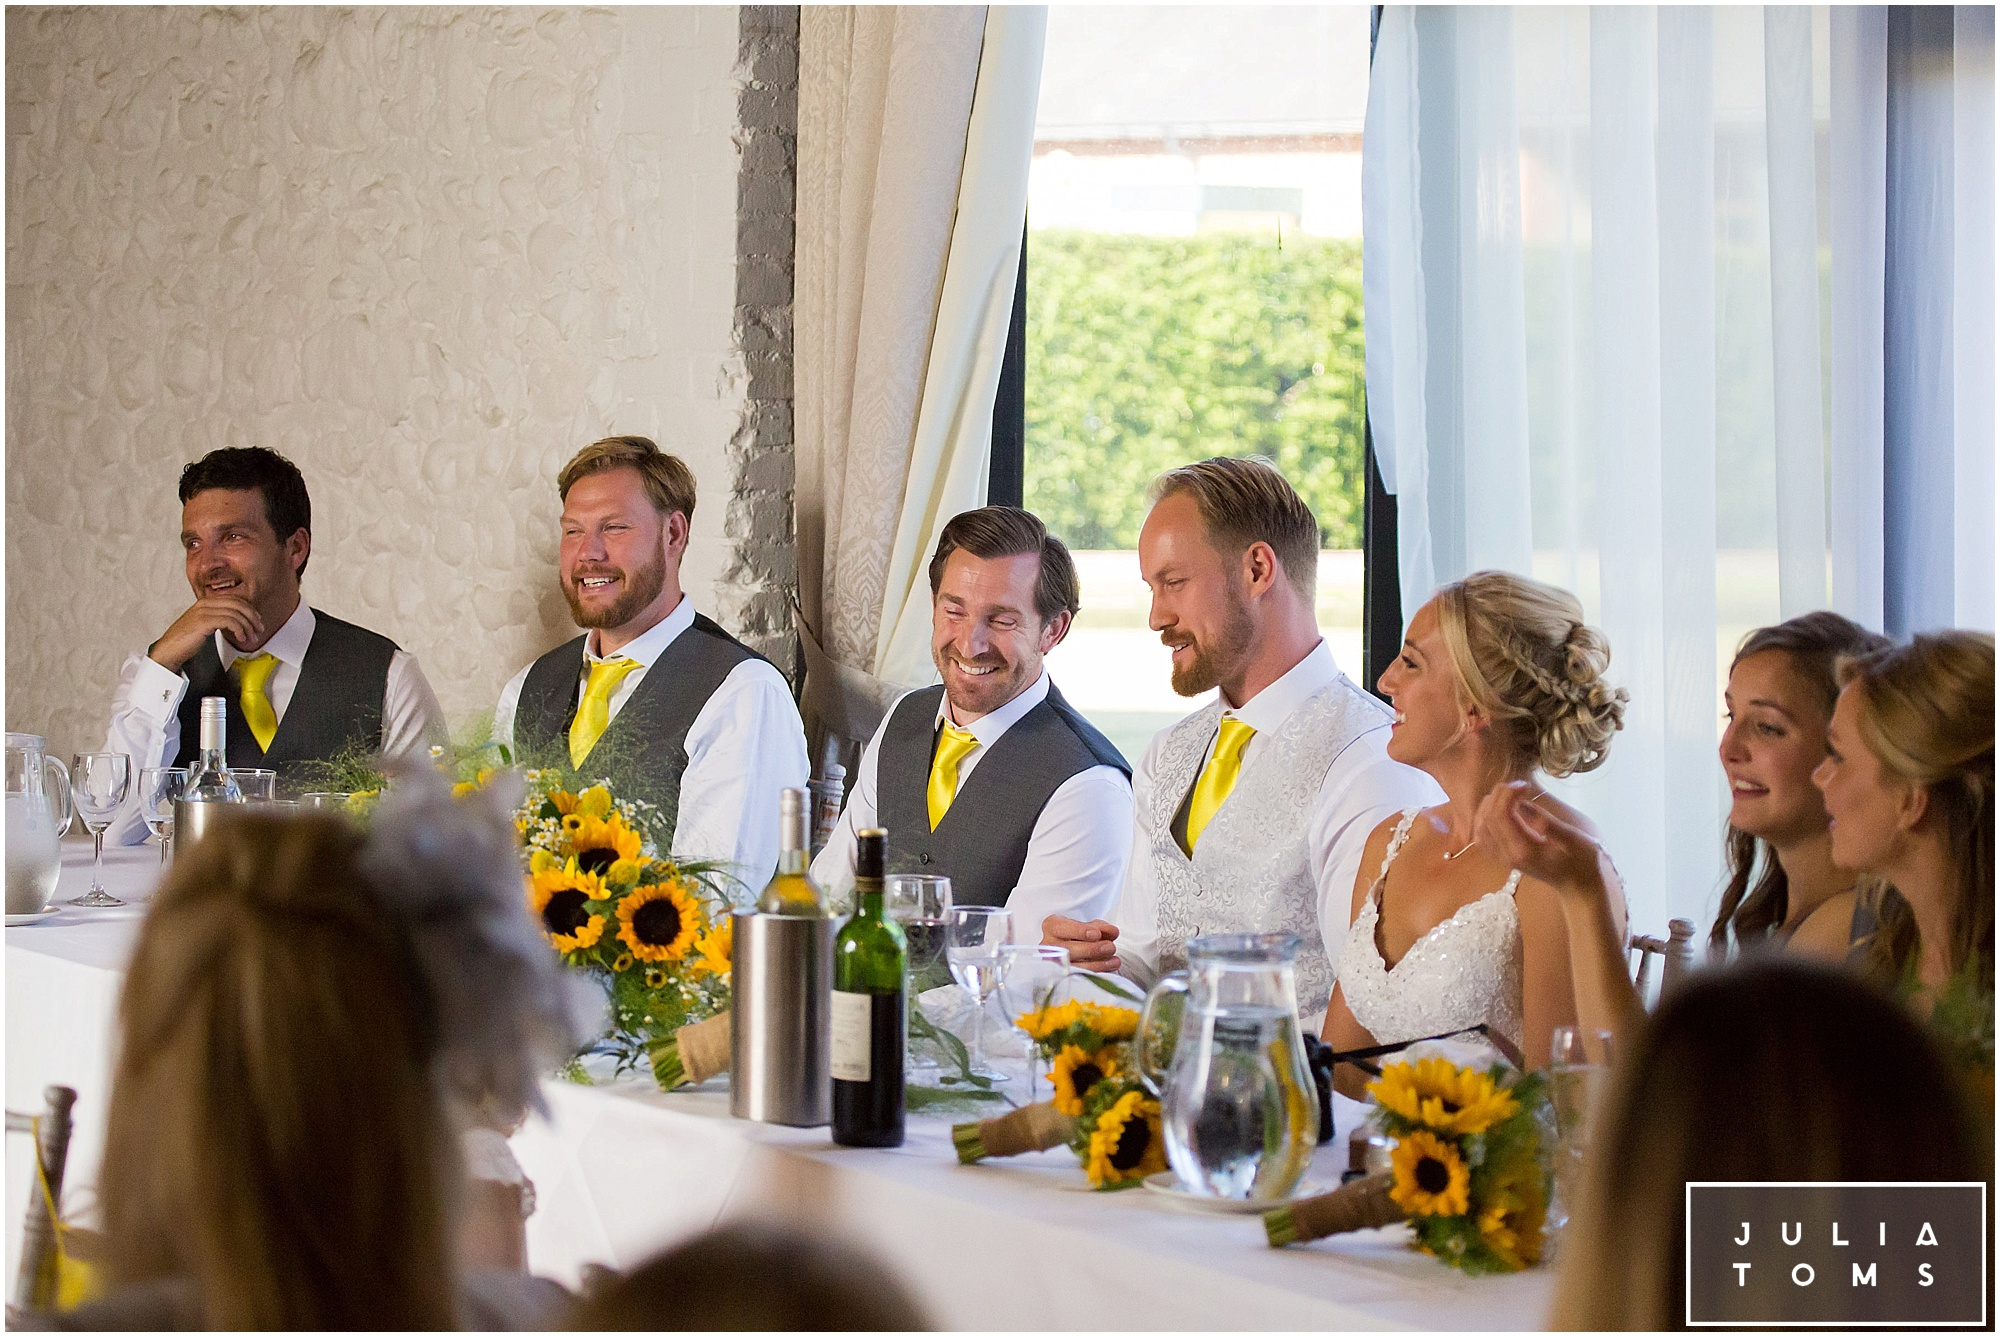 julia_toms_chichester_wedding_photographer_worthing_076.jpg